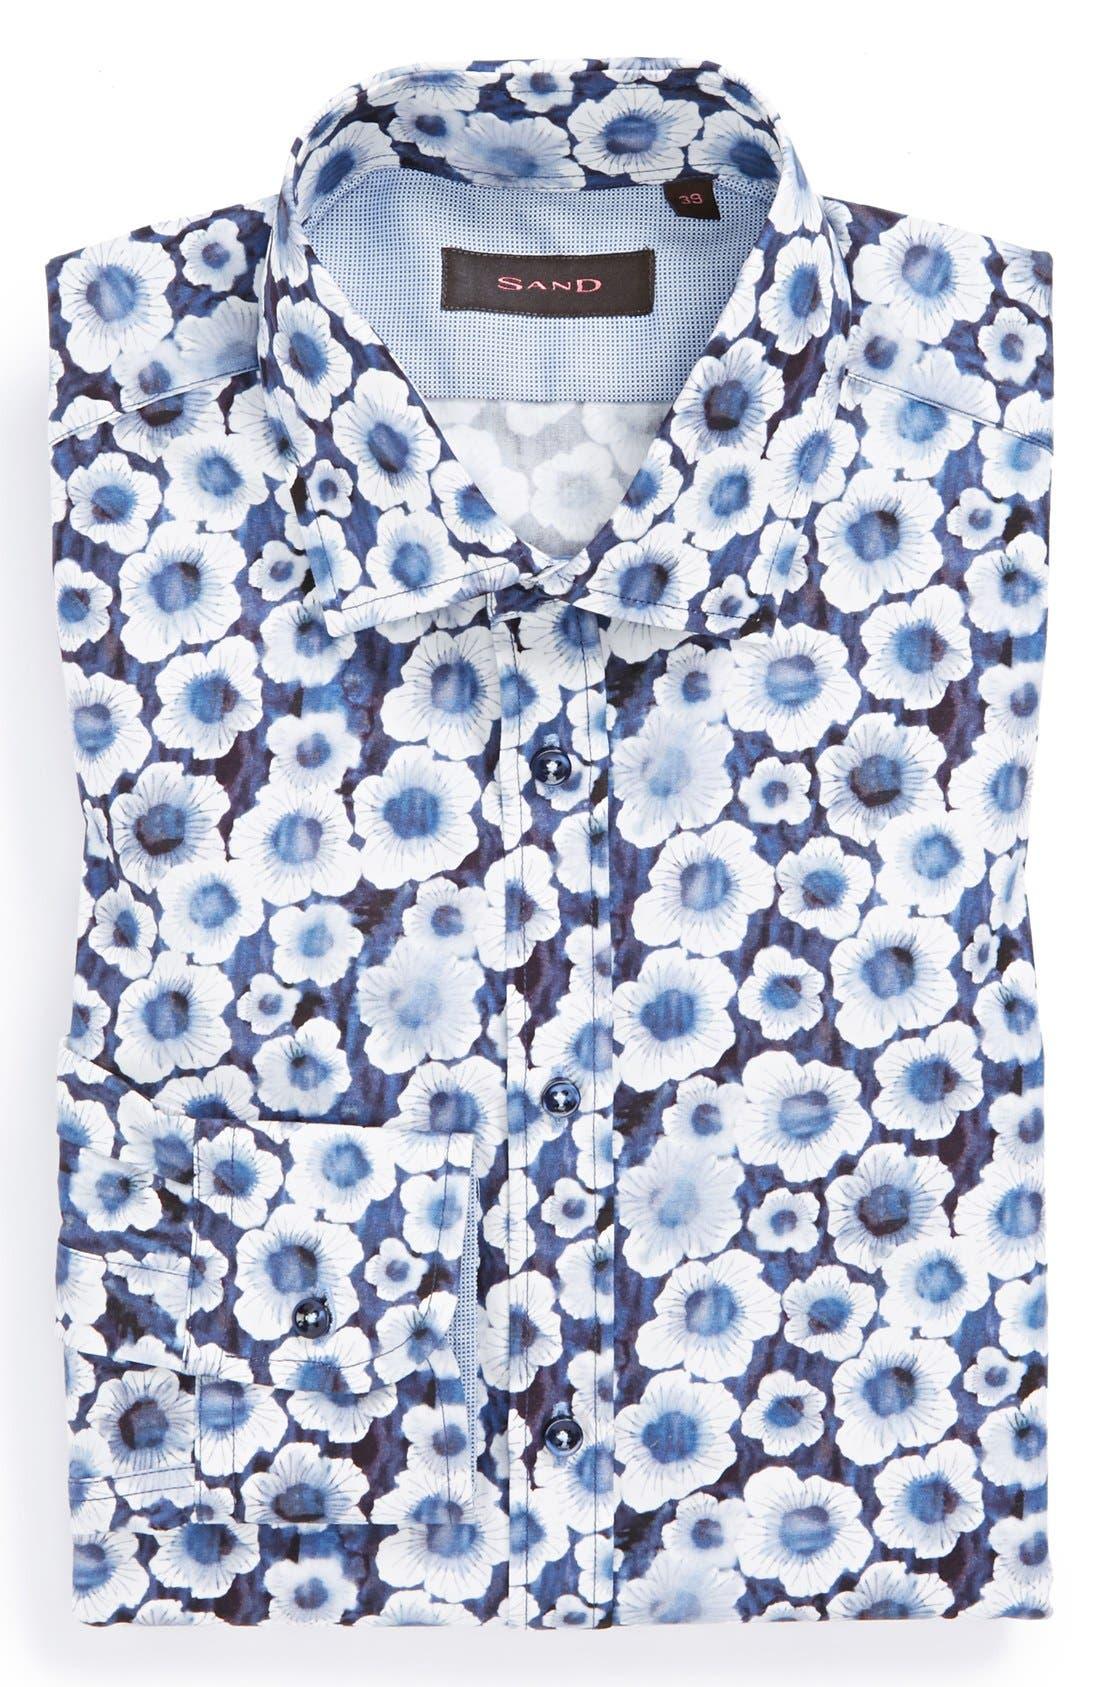 Alternate Image 1 Selected - SAND Trim Fit Floral Print Dress Shirt